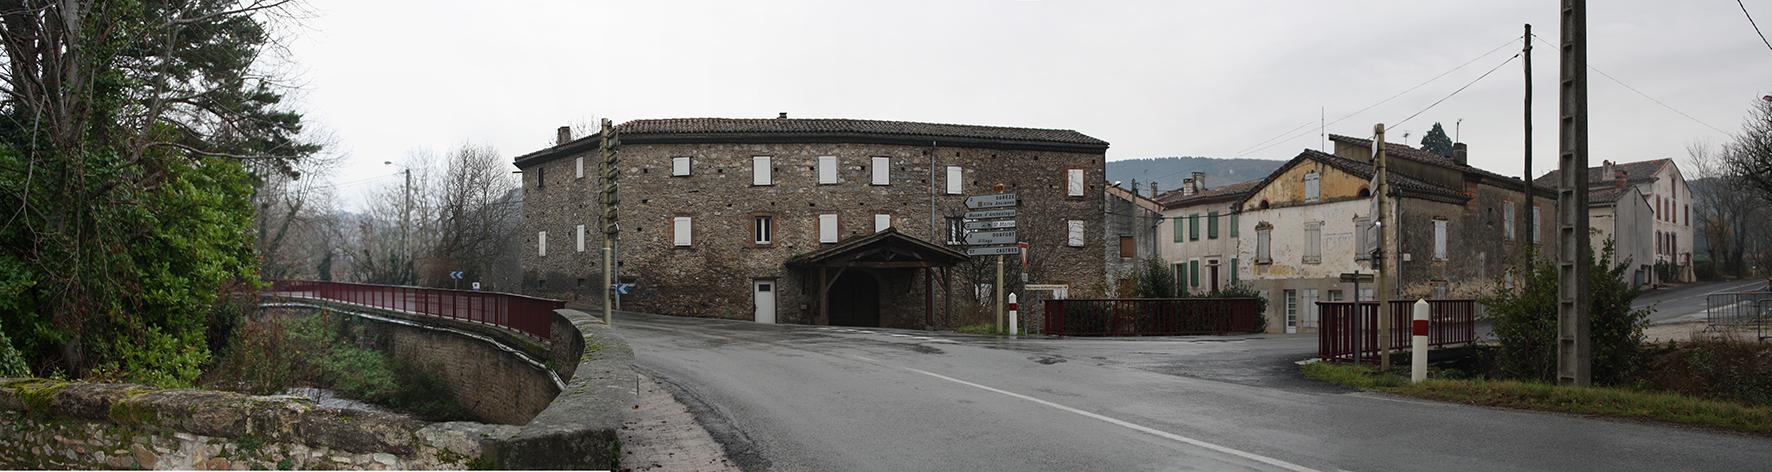 Pano façade+hameau.jpg